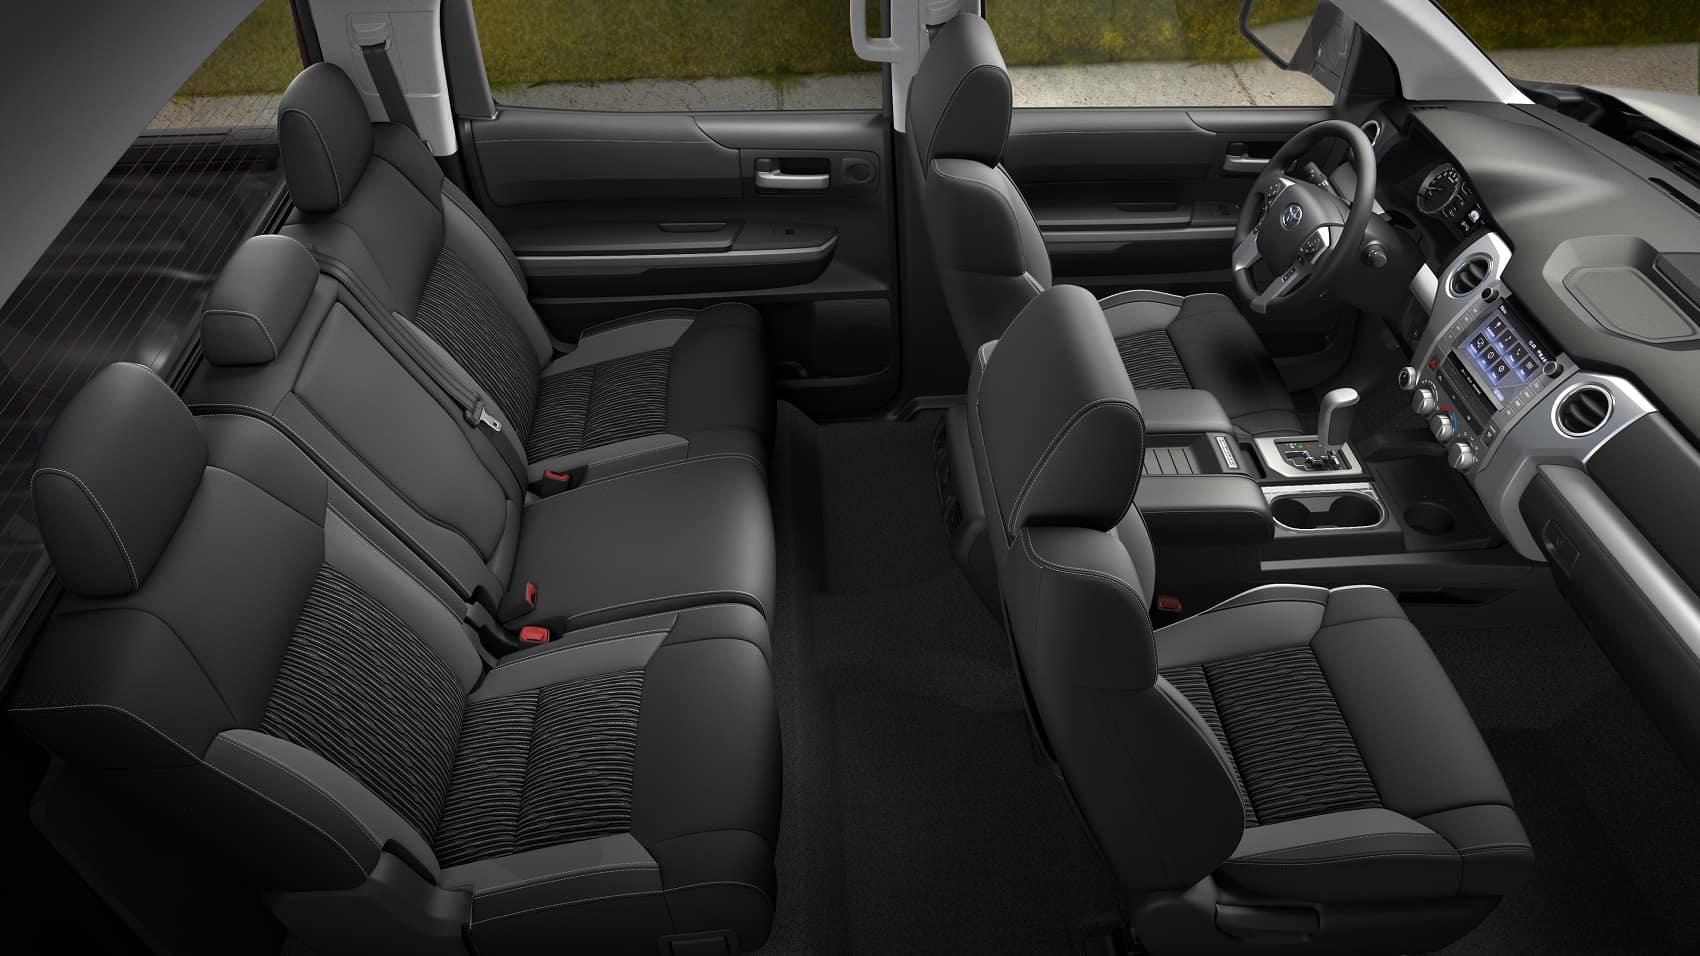 2020 Toyota Tundra Interior Space